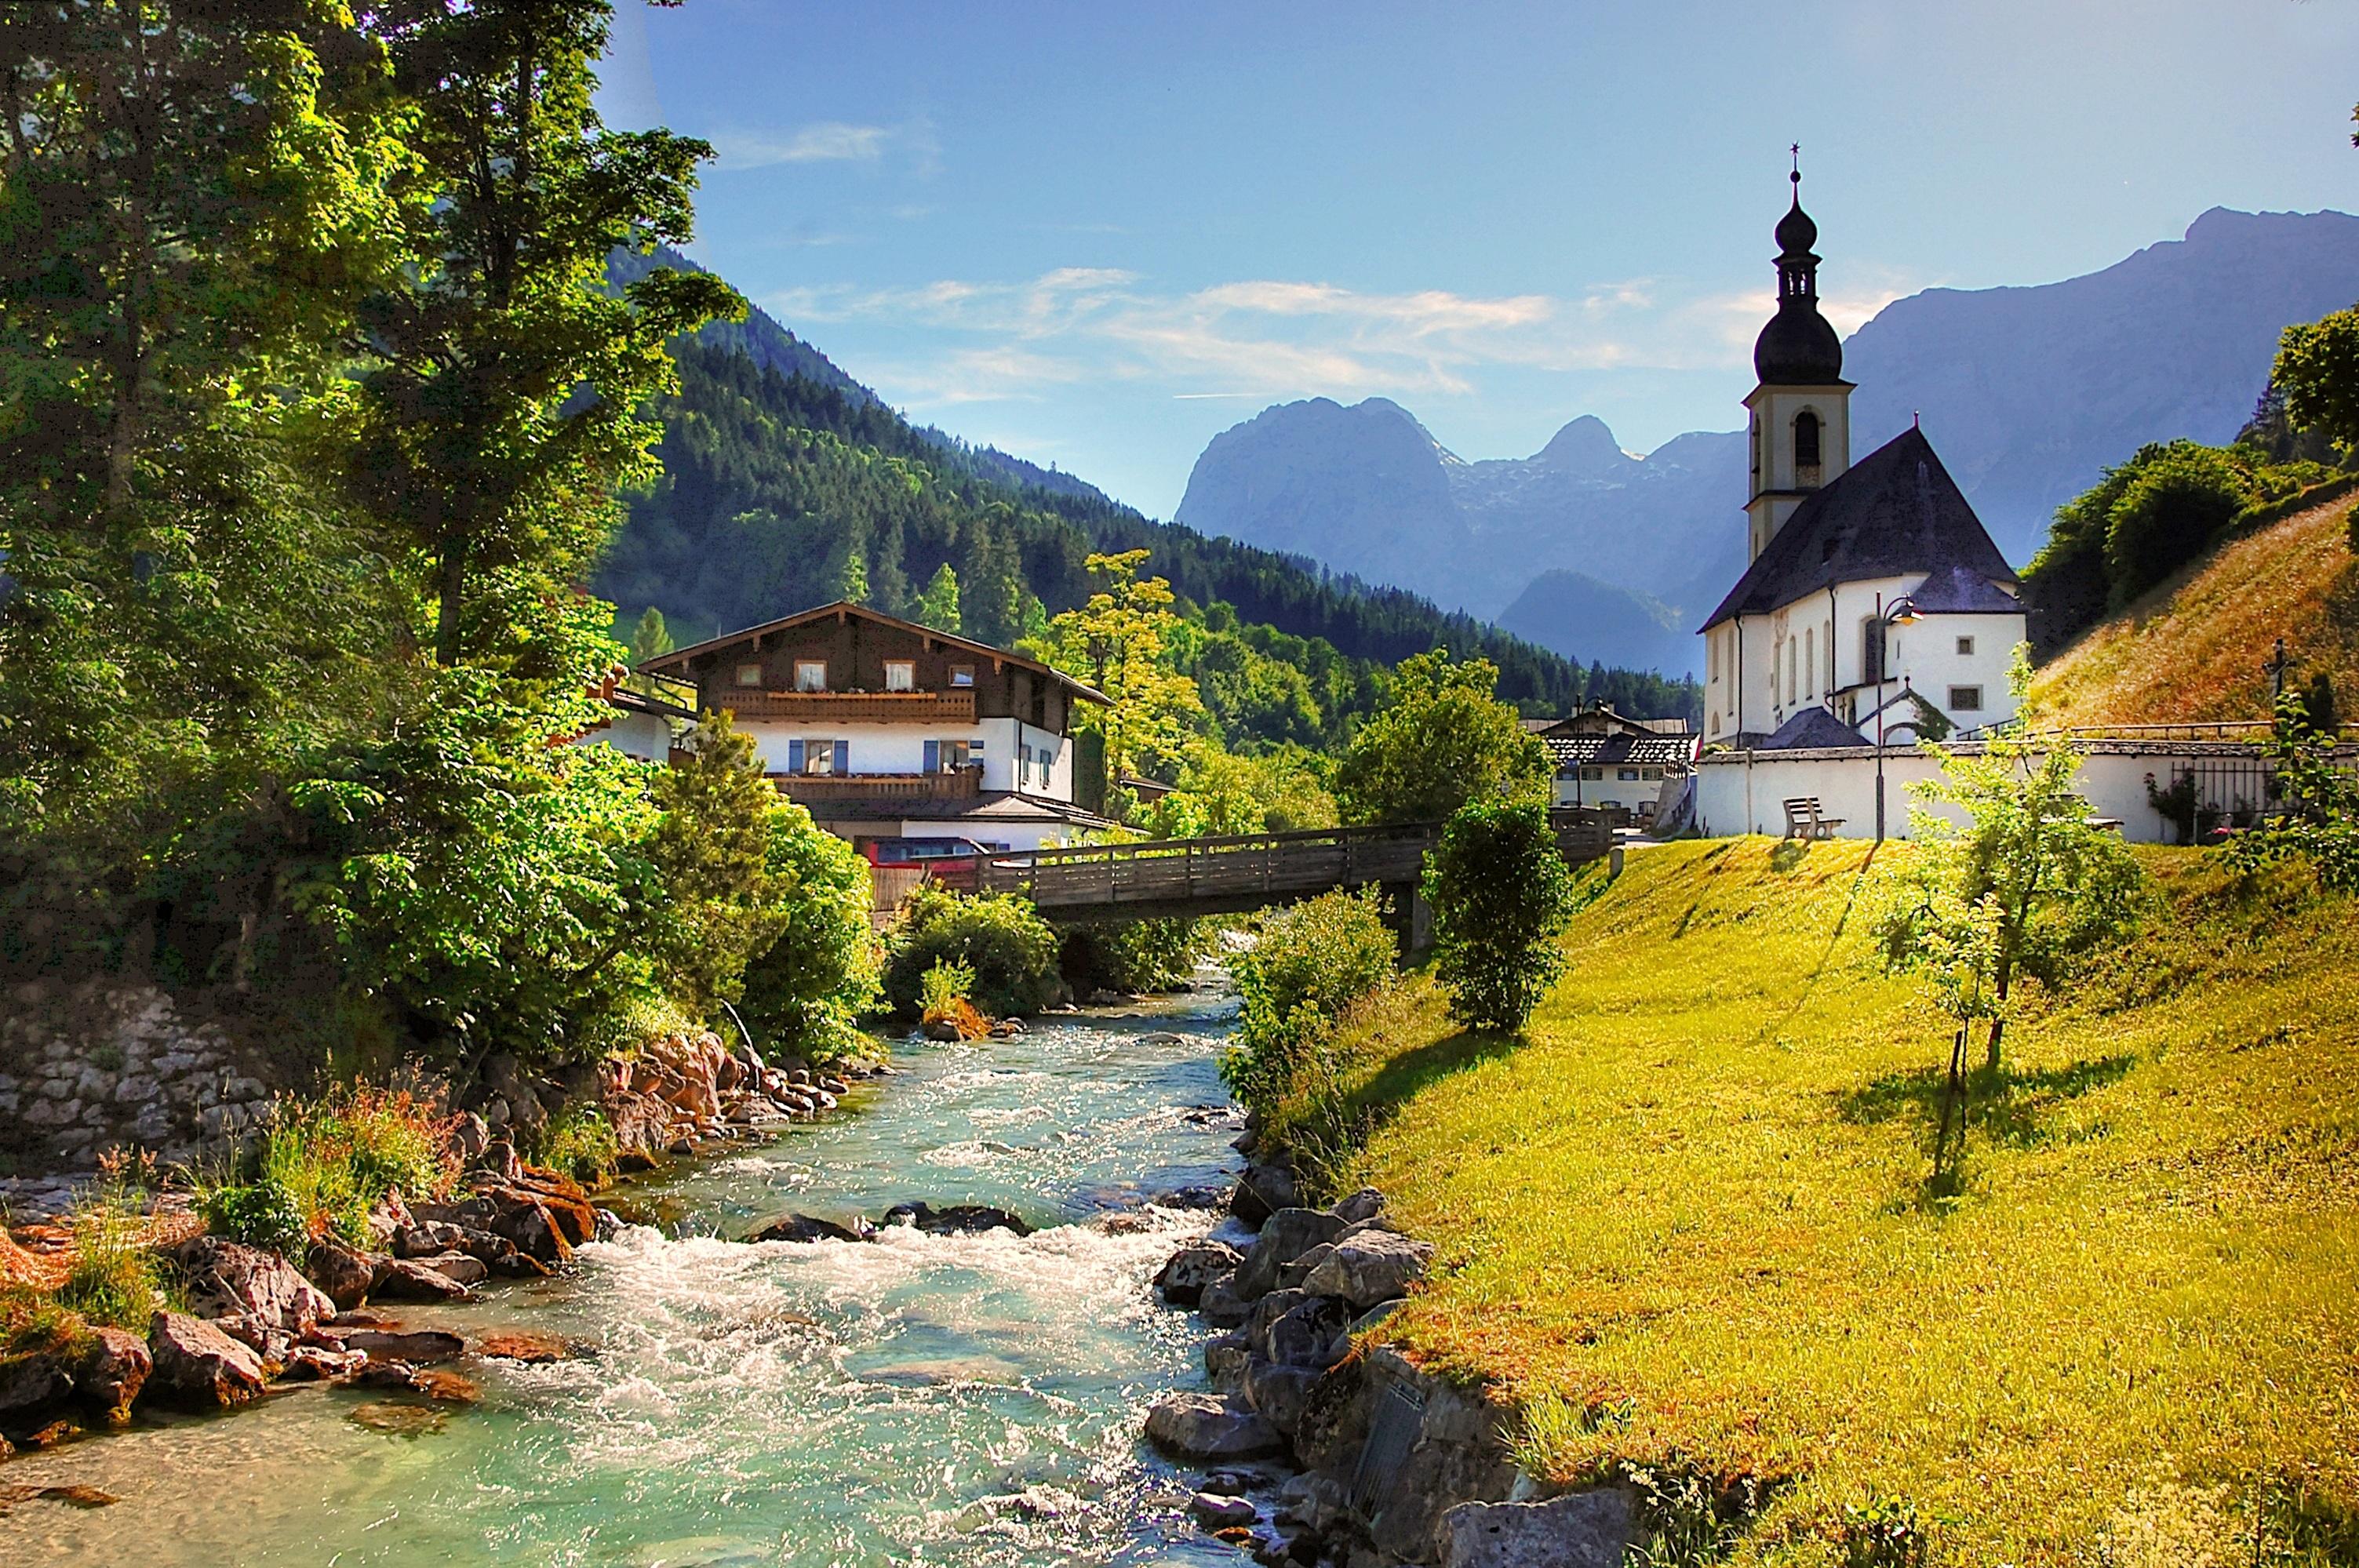 Free stock photo of landscape, mountains, nature, landmark